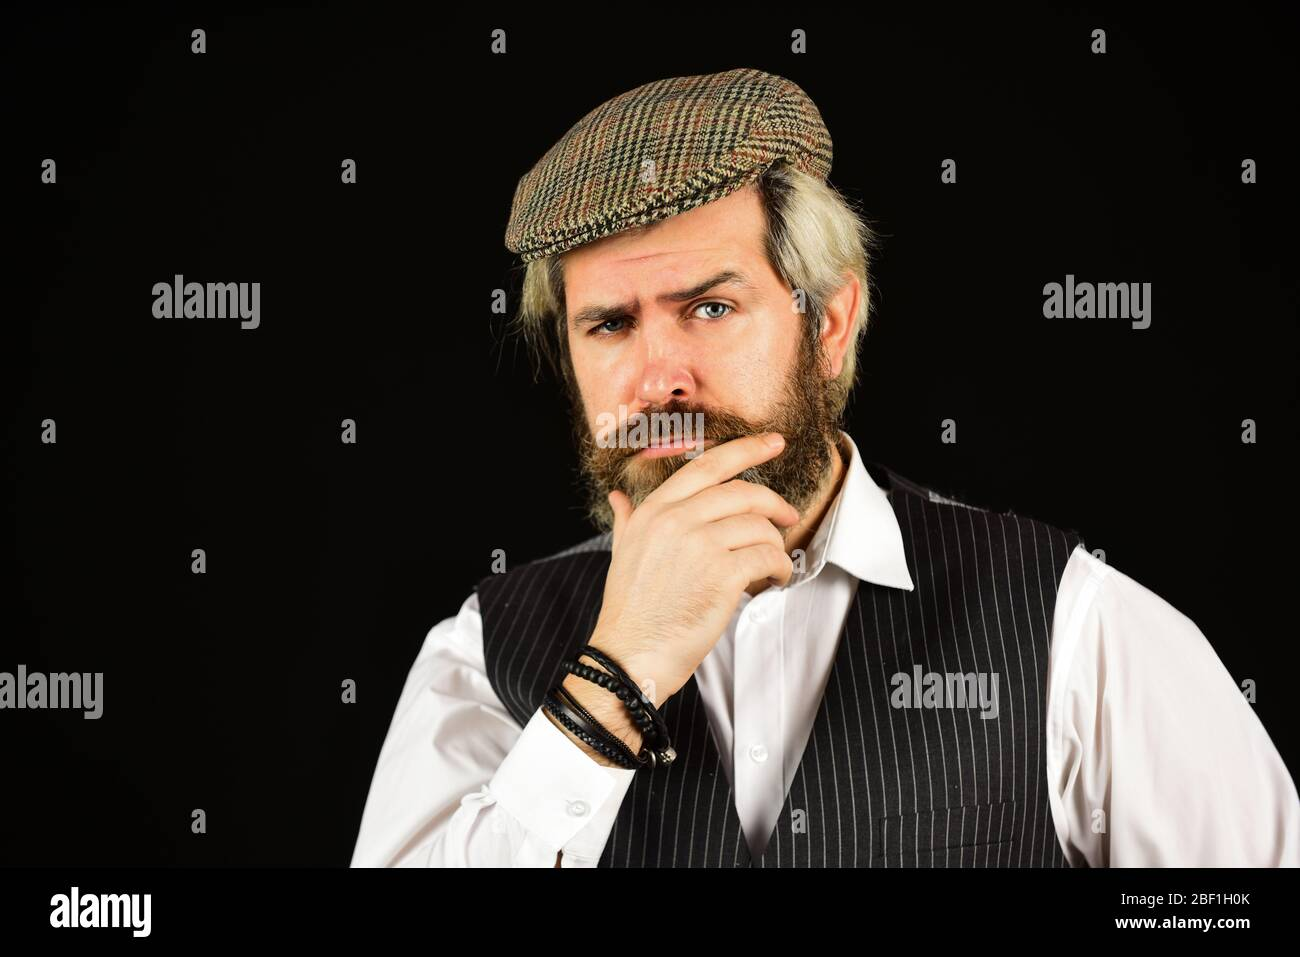 Farmer/'s Beard Brown Dress up Costume Facial hair